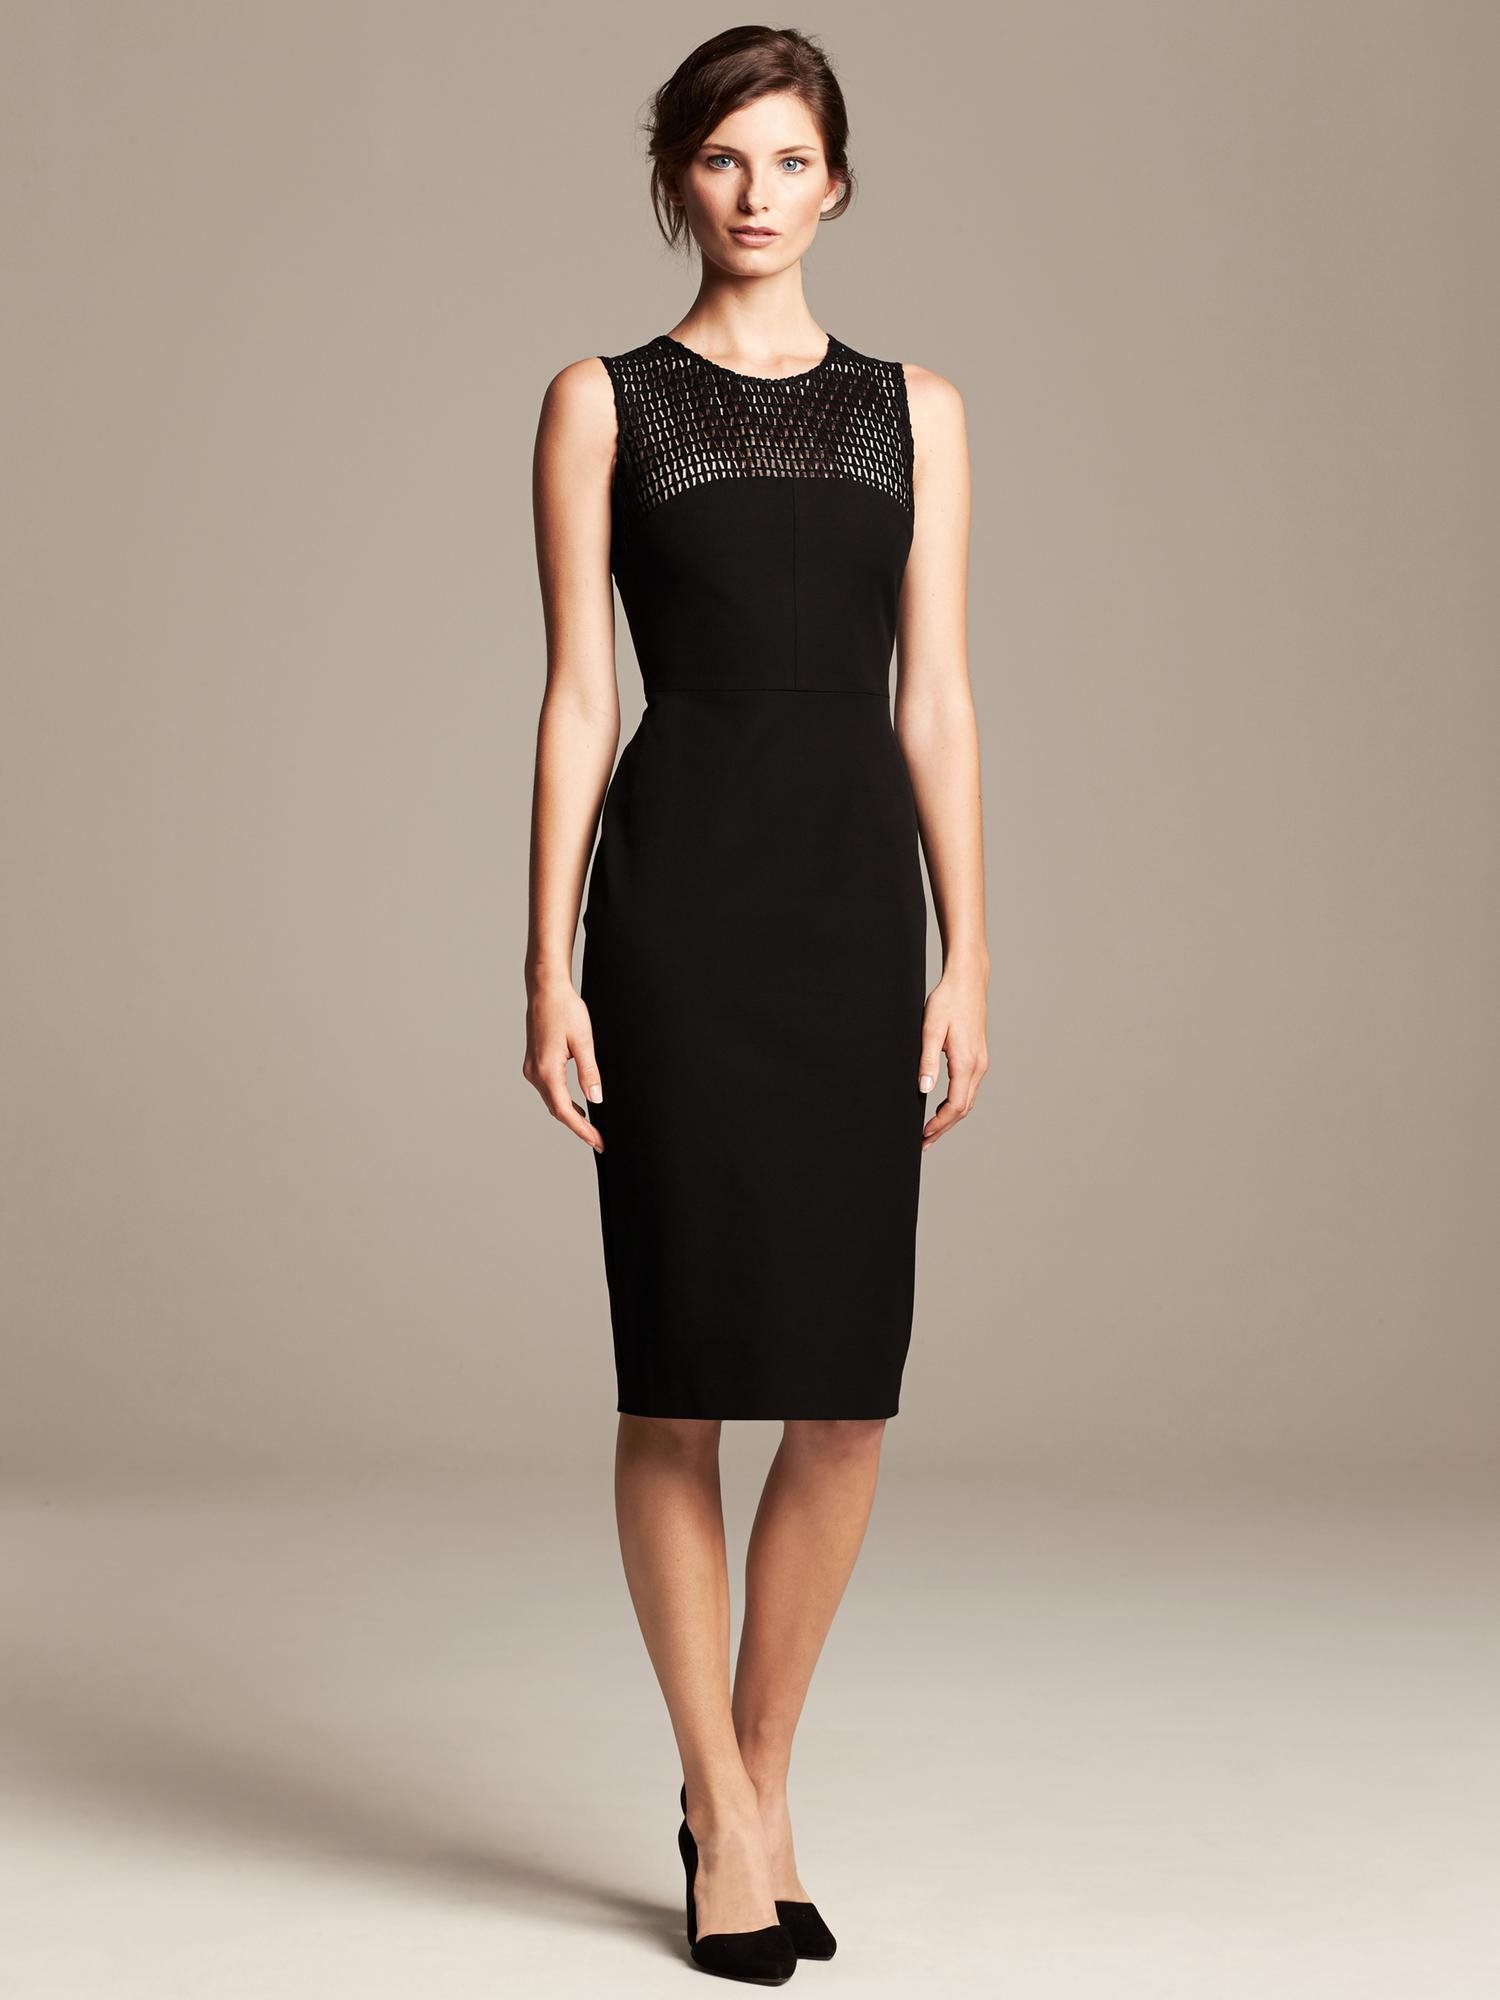 e9f9b49db23 black lace dress banana republic – Little Black Dress